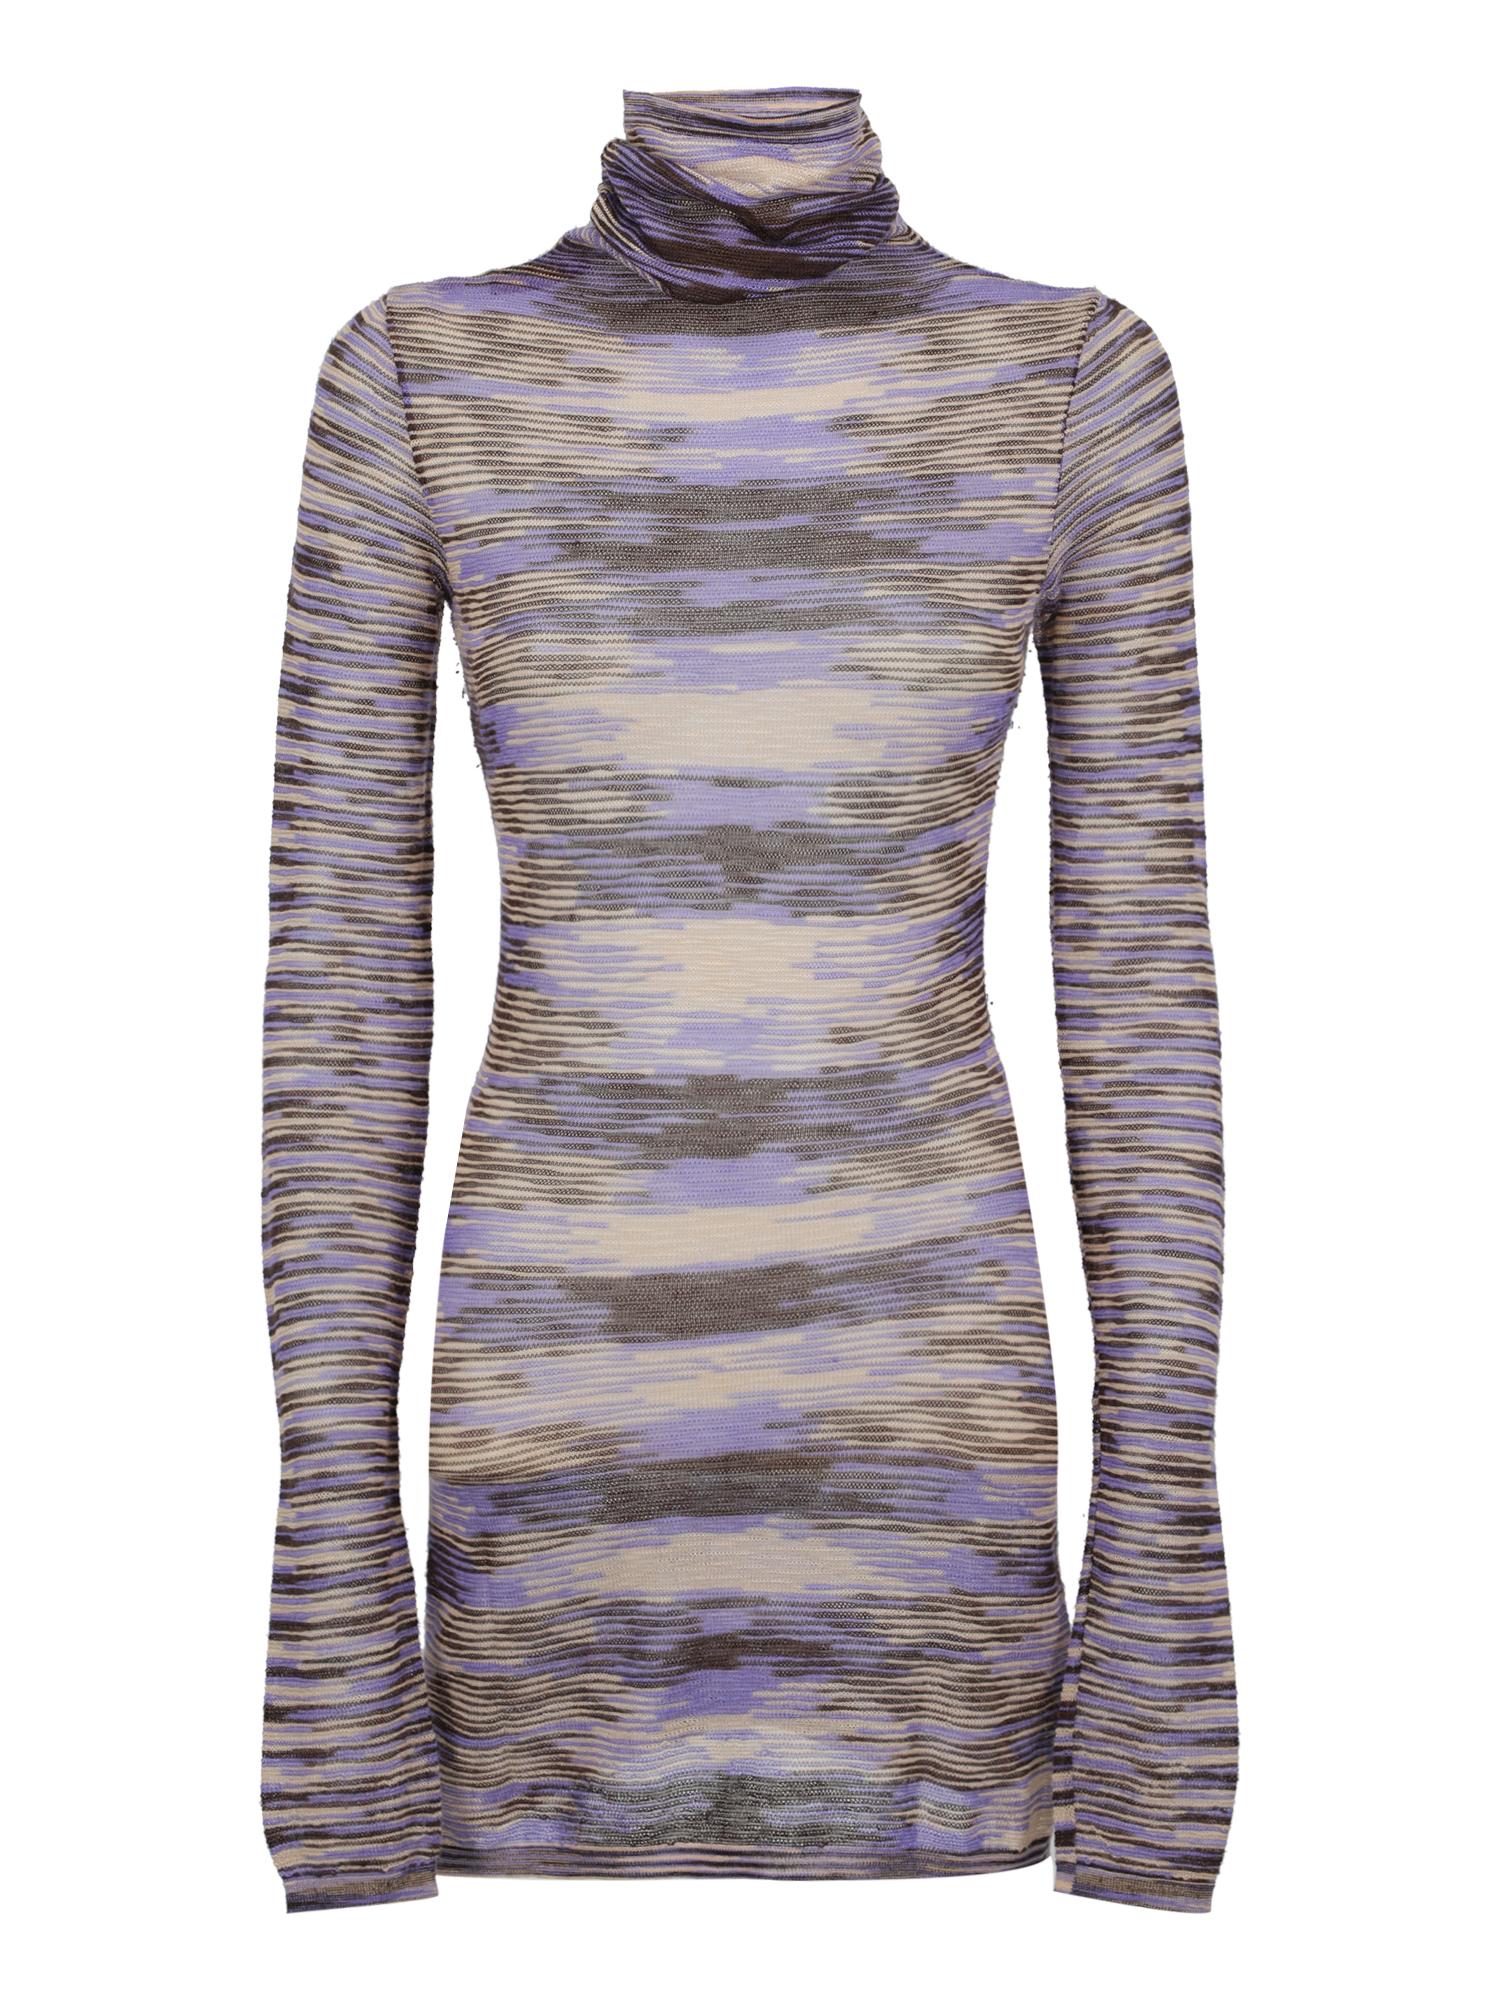 Pre-owned Missoni Clothing In Brown, Purple